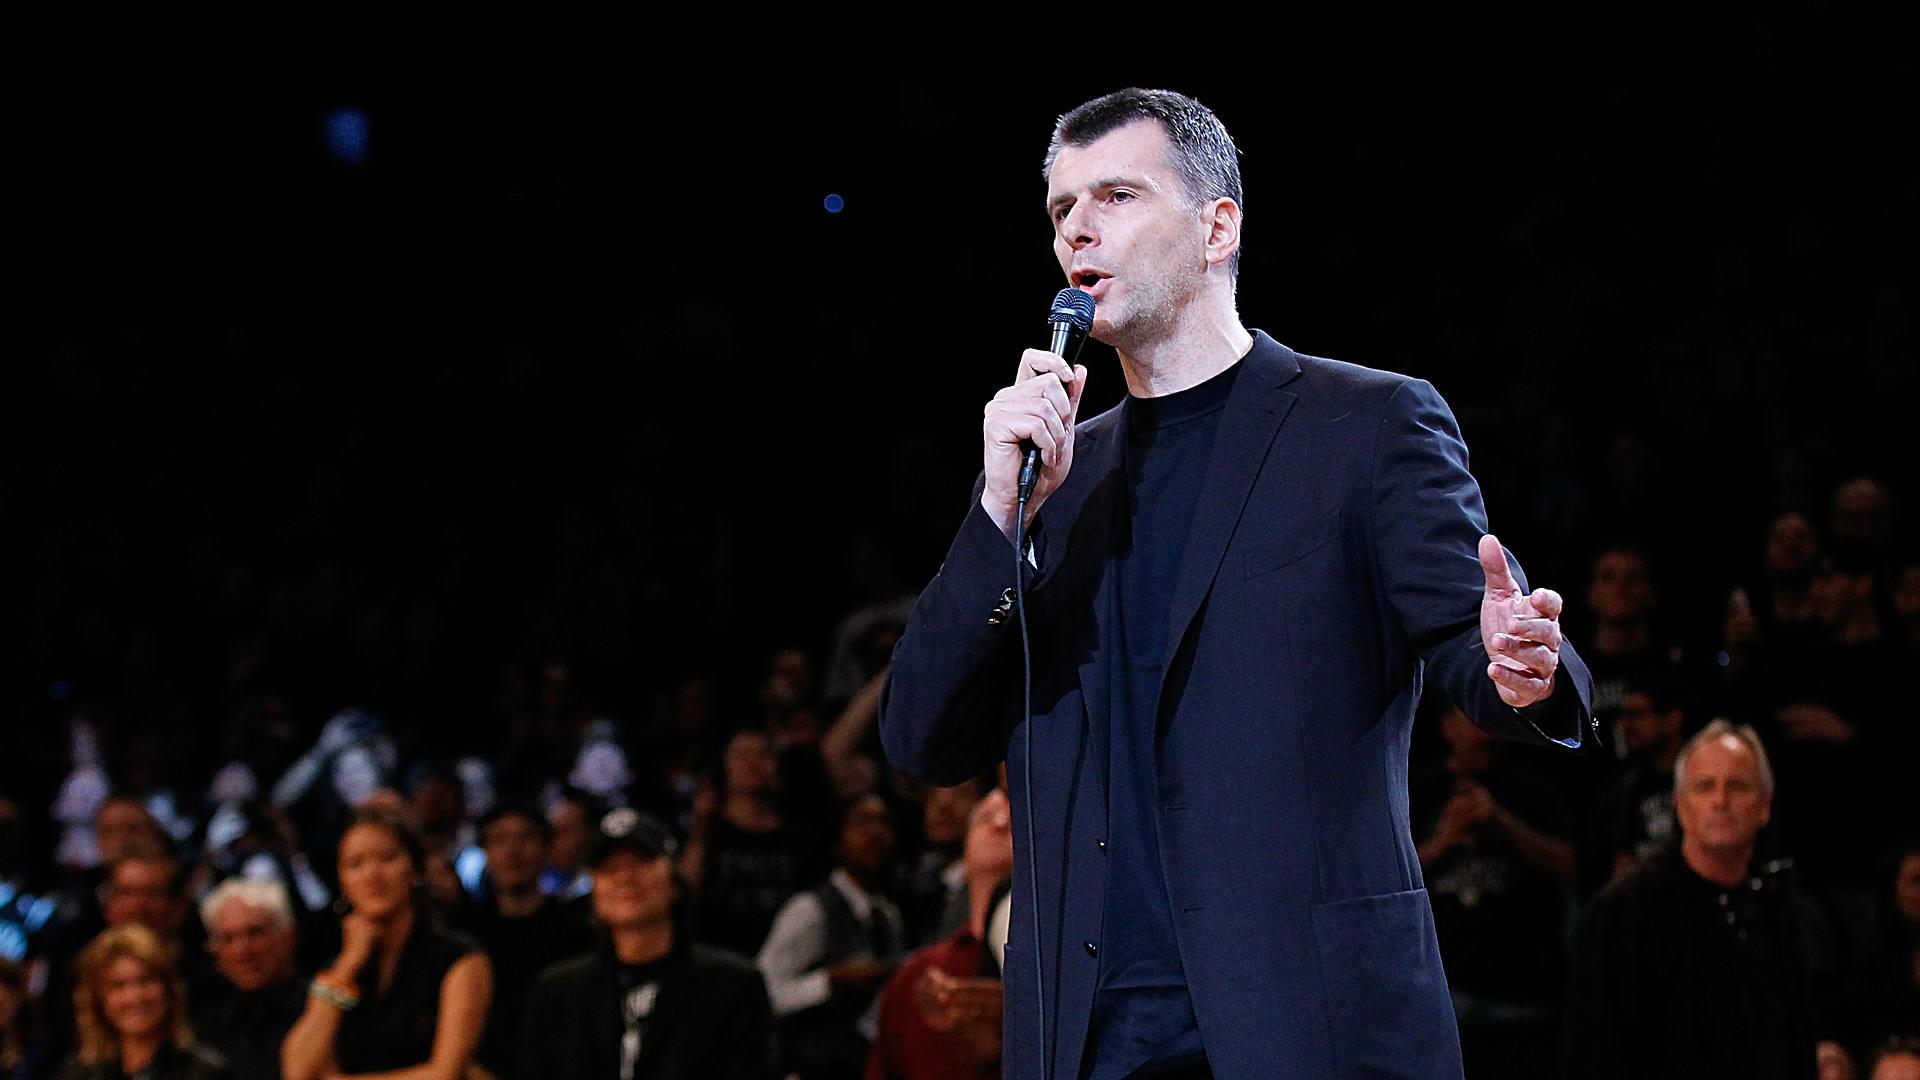 Mikhail-Prokhorov-100314-FTR-Getty.jpg